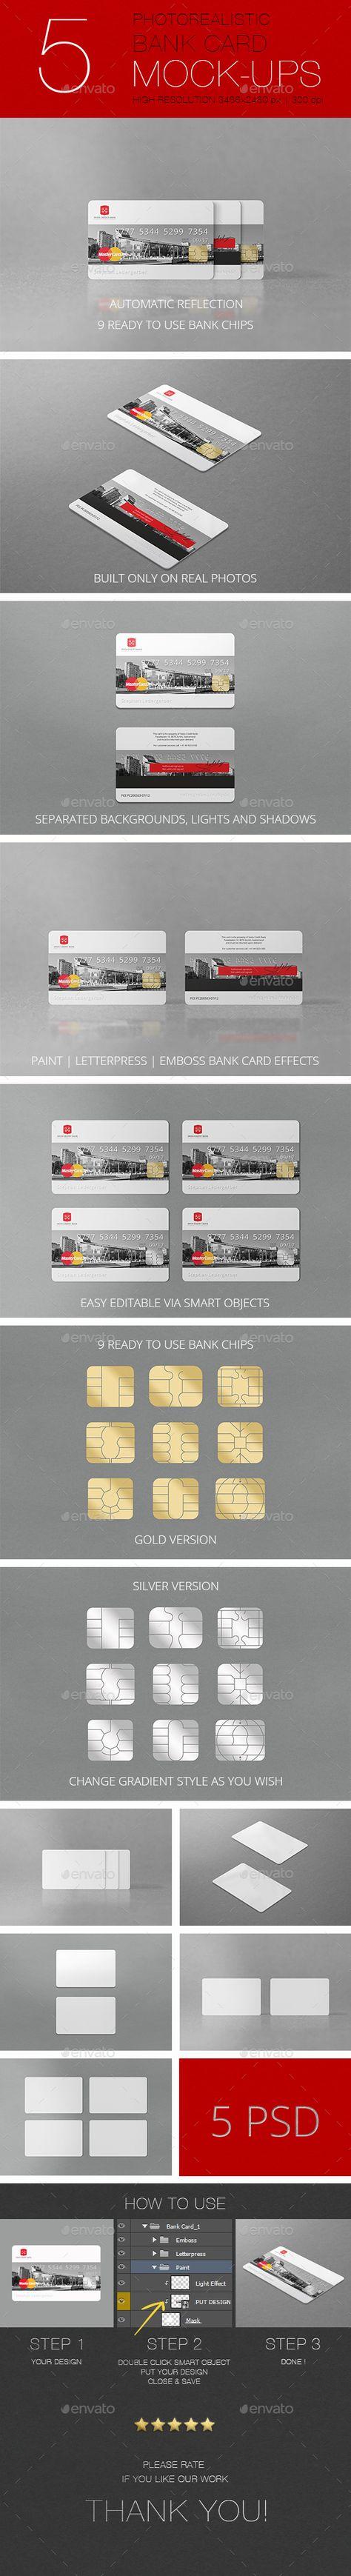 sample invitation letter for chins2 visa%0A Bank Card  Credit Card  Layout  PSD Template u     Front   Back u     Smart Layer  Card Number u     Smart Layer Expiration Date u     Smart Layer Cardholder Name u     Sma u